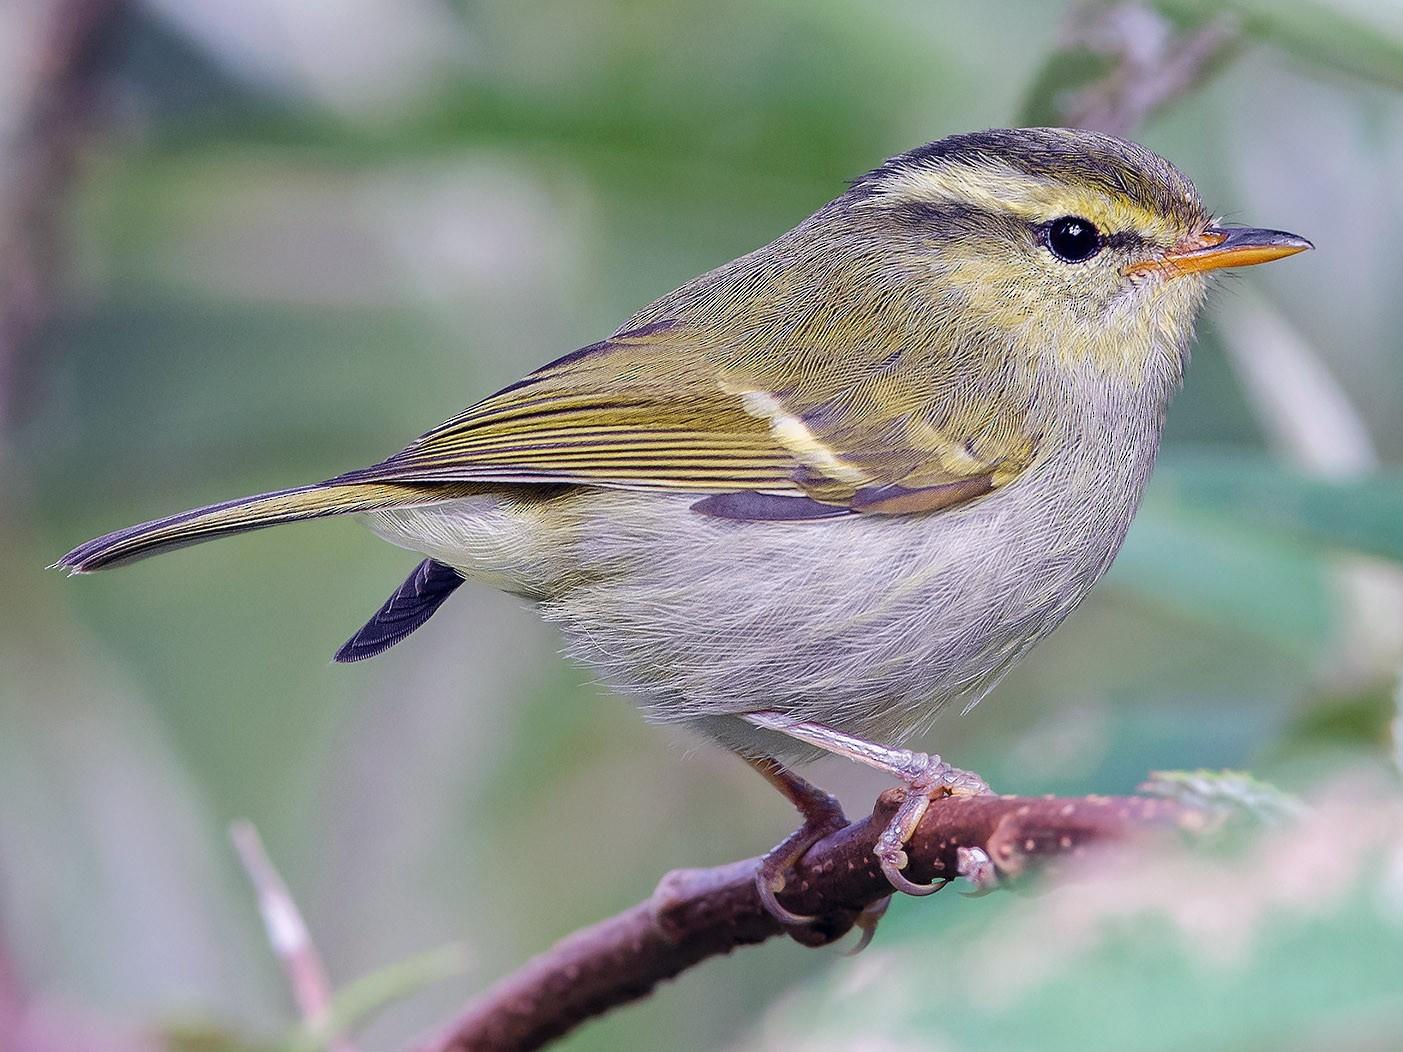 Davison's Leaf Warbler - Natthaphat Chotjuckdikul